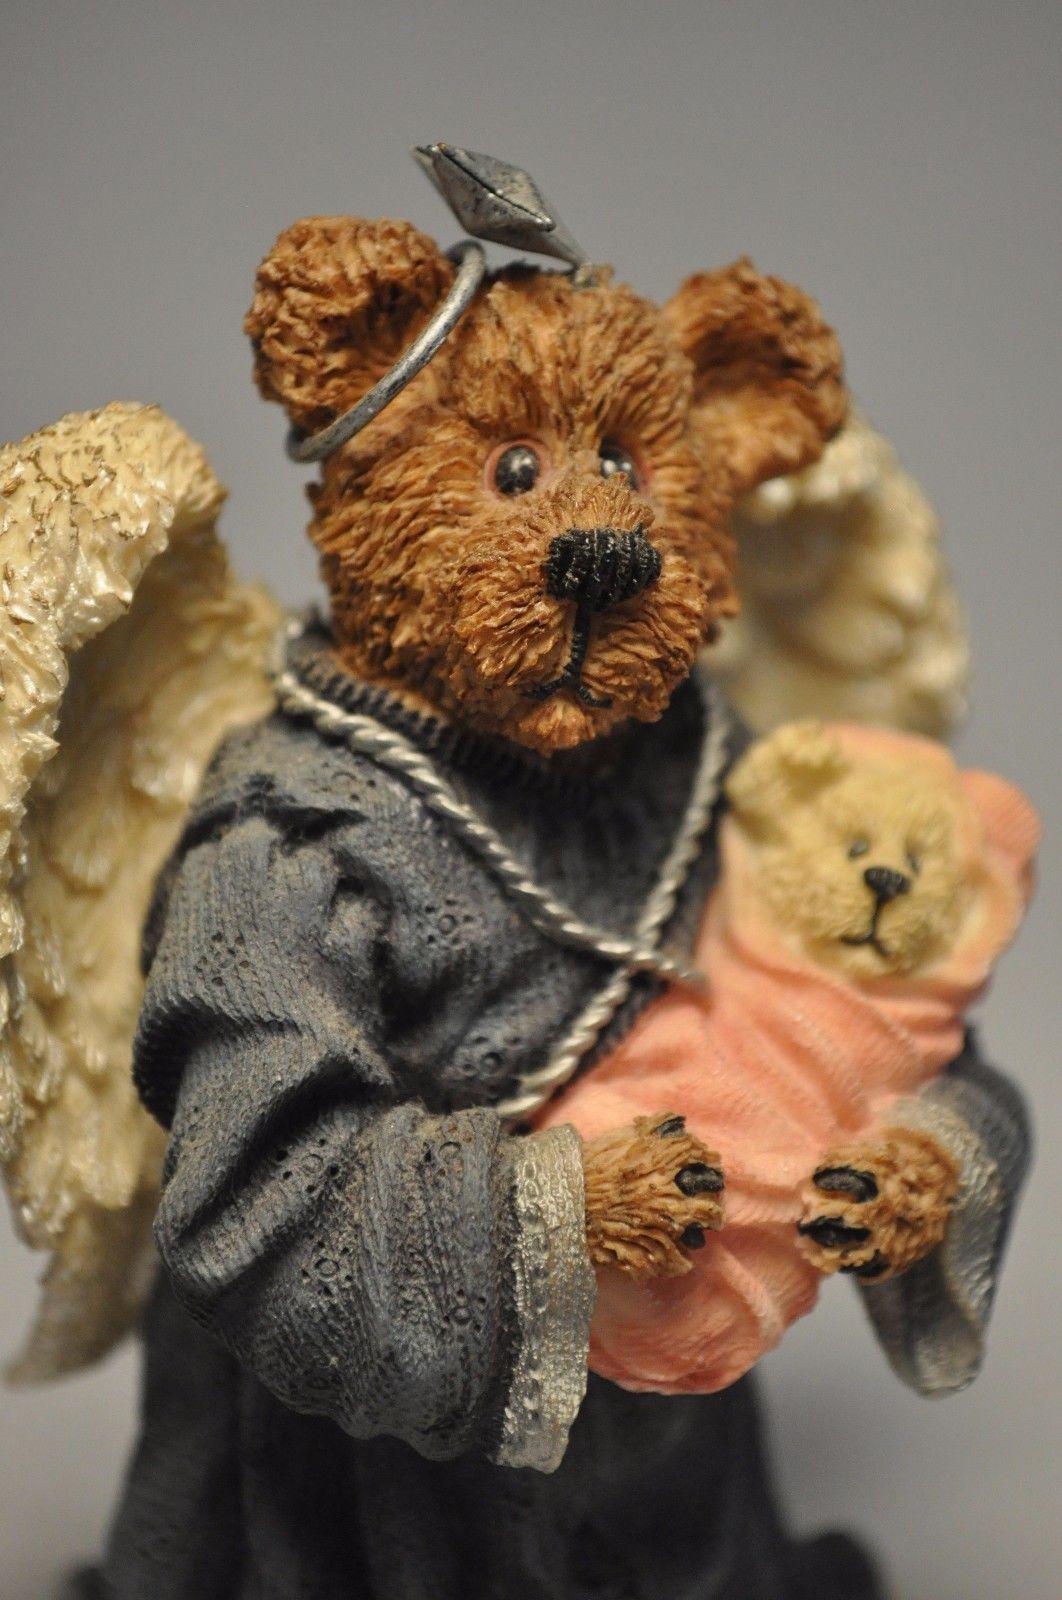 Boyds Bears & Friends: Charity Angelhug & Everychild... 228343 Cherish The Child image 3